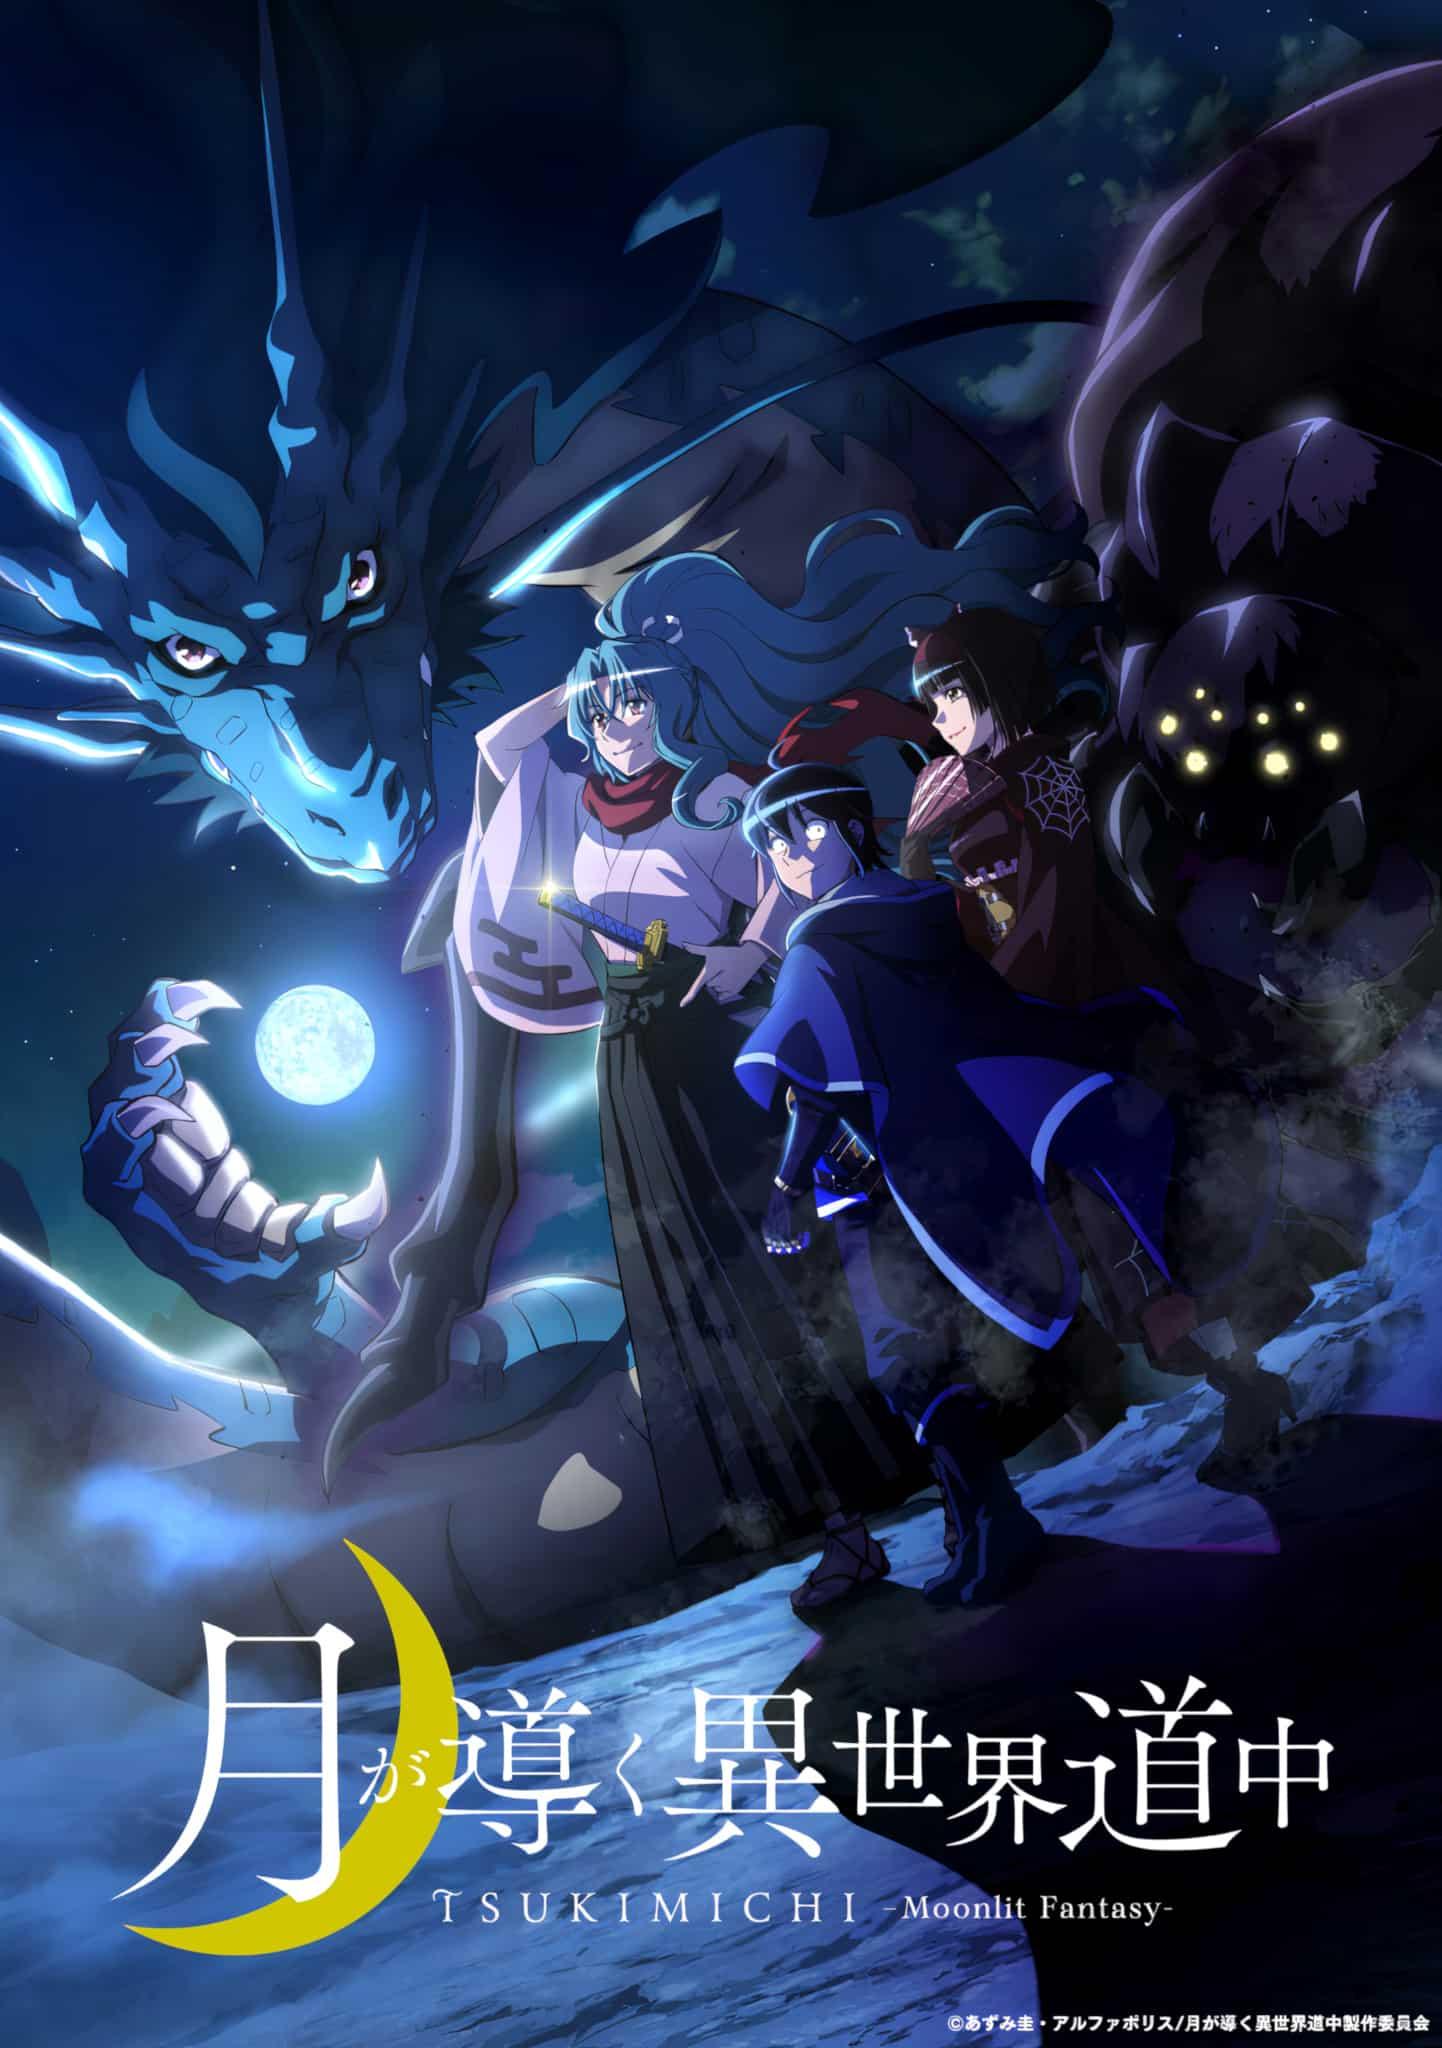 anime-Tsukimichi-moonlit-fantasy.jpeg